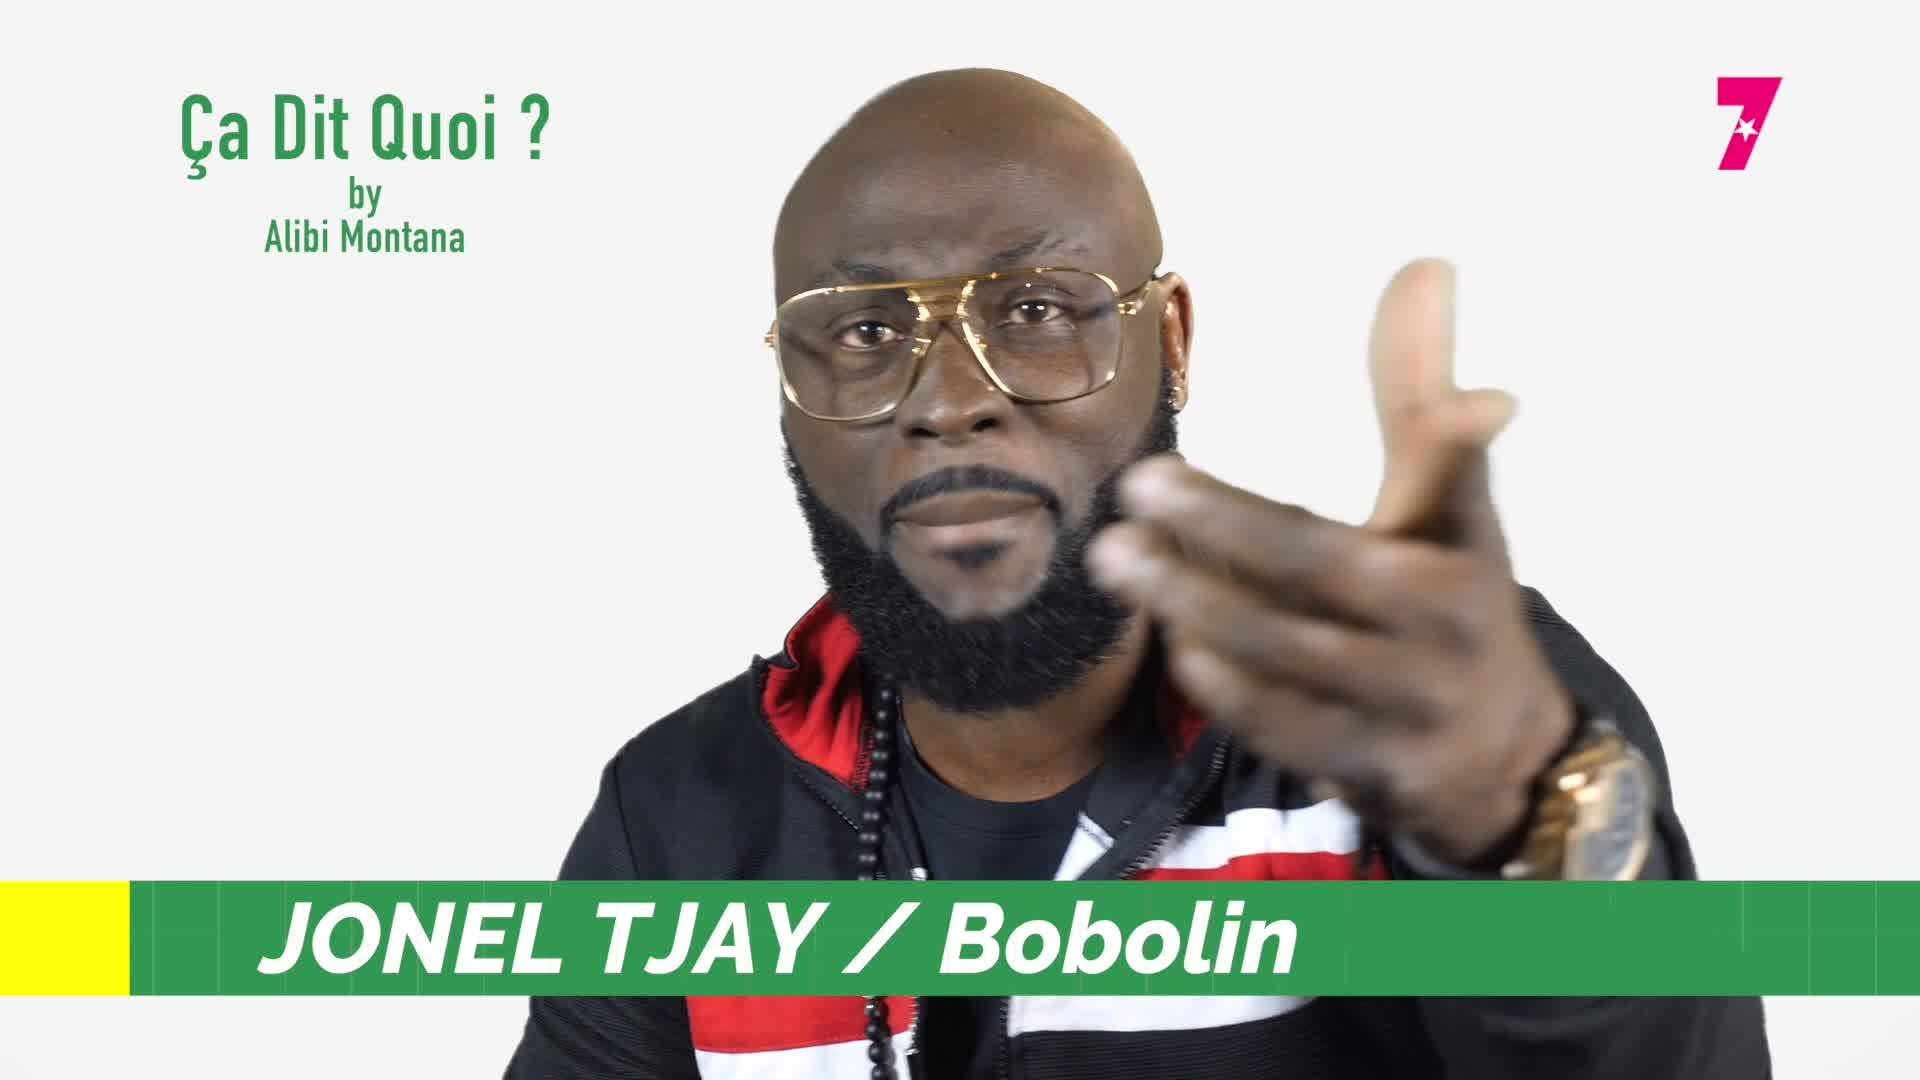 #ça_dit_quoi?  Jonel Tjay sort #Bobolin